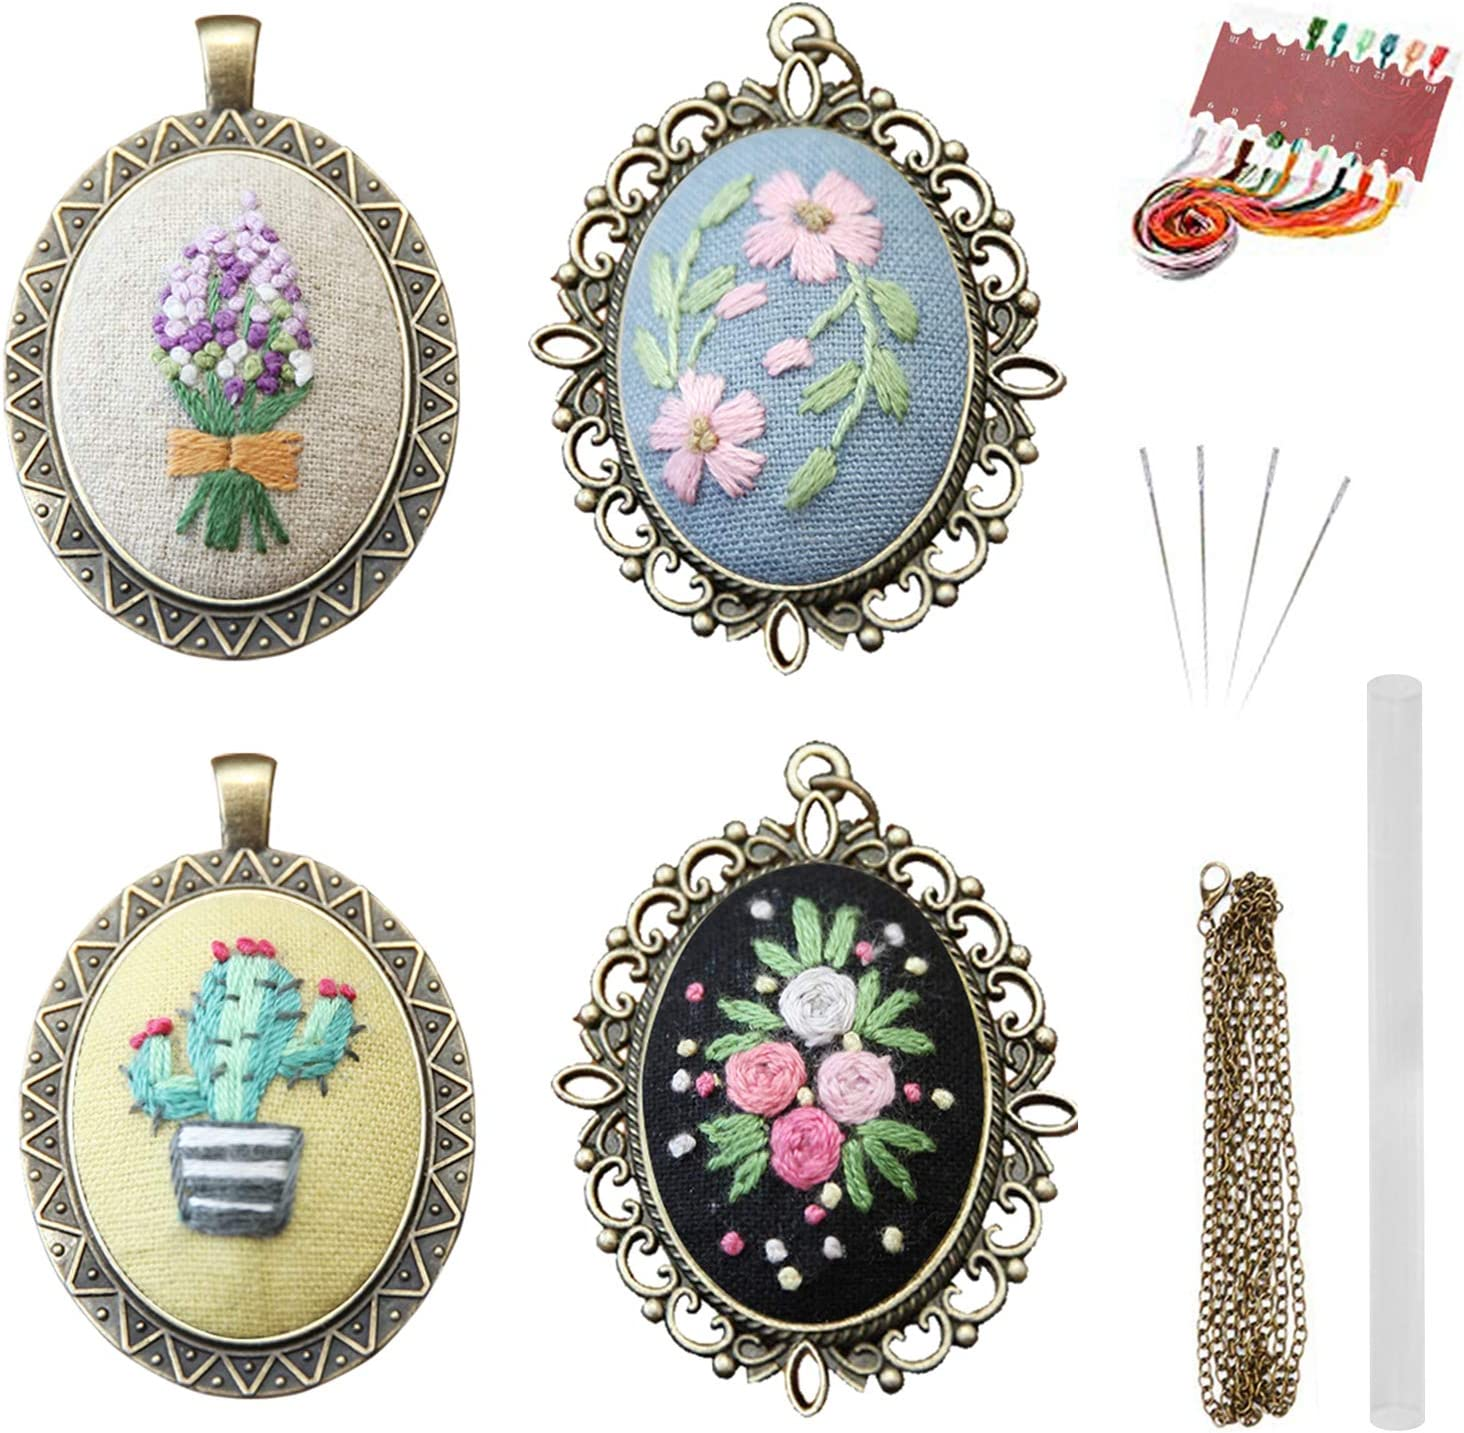 Crochet Necklace Floral Necklace Crochet Flowers Necklace Linen Necklace Mauve Necklace Handmade Jewellery